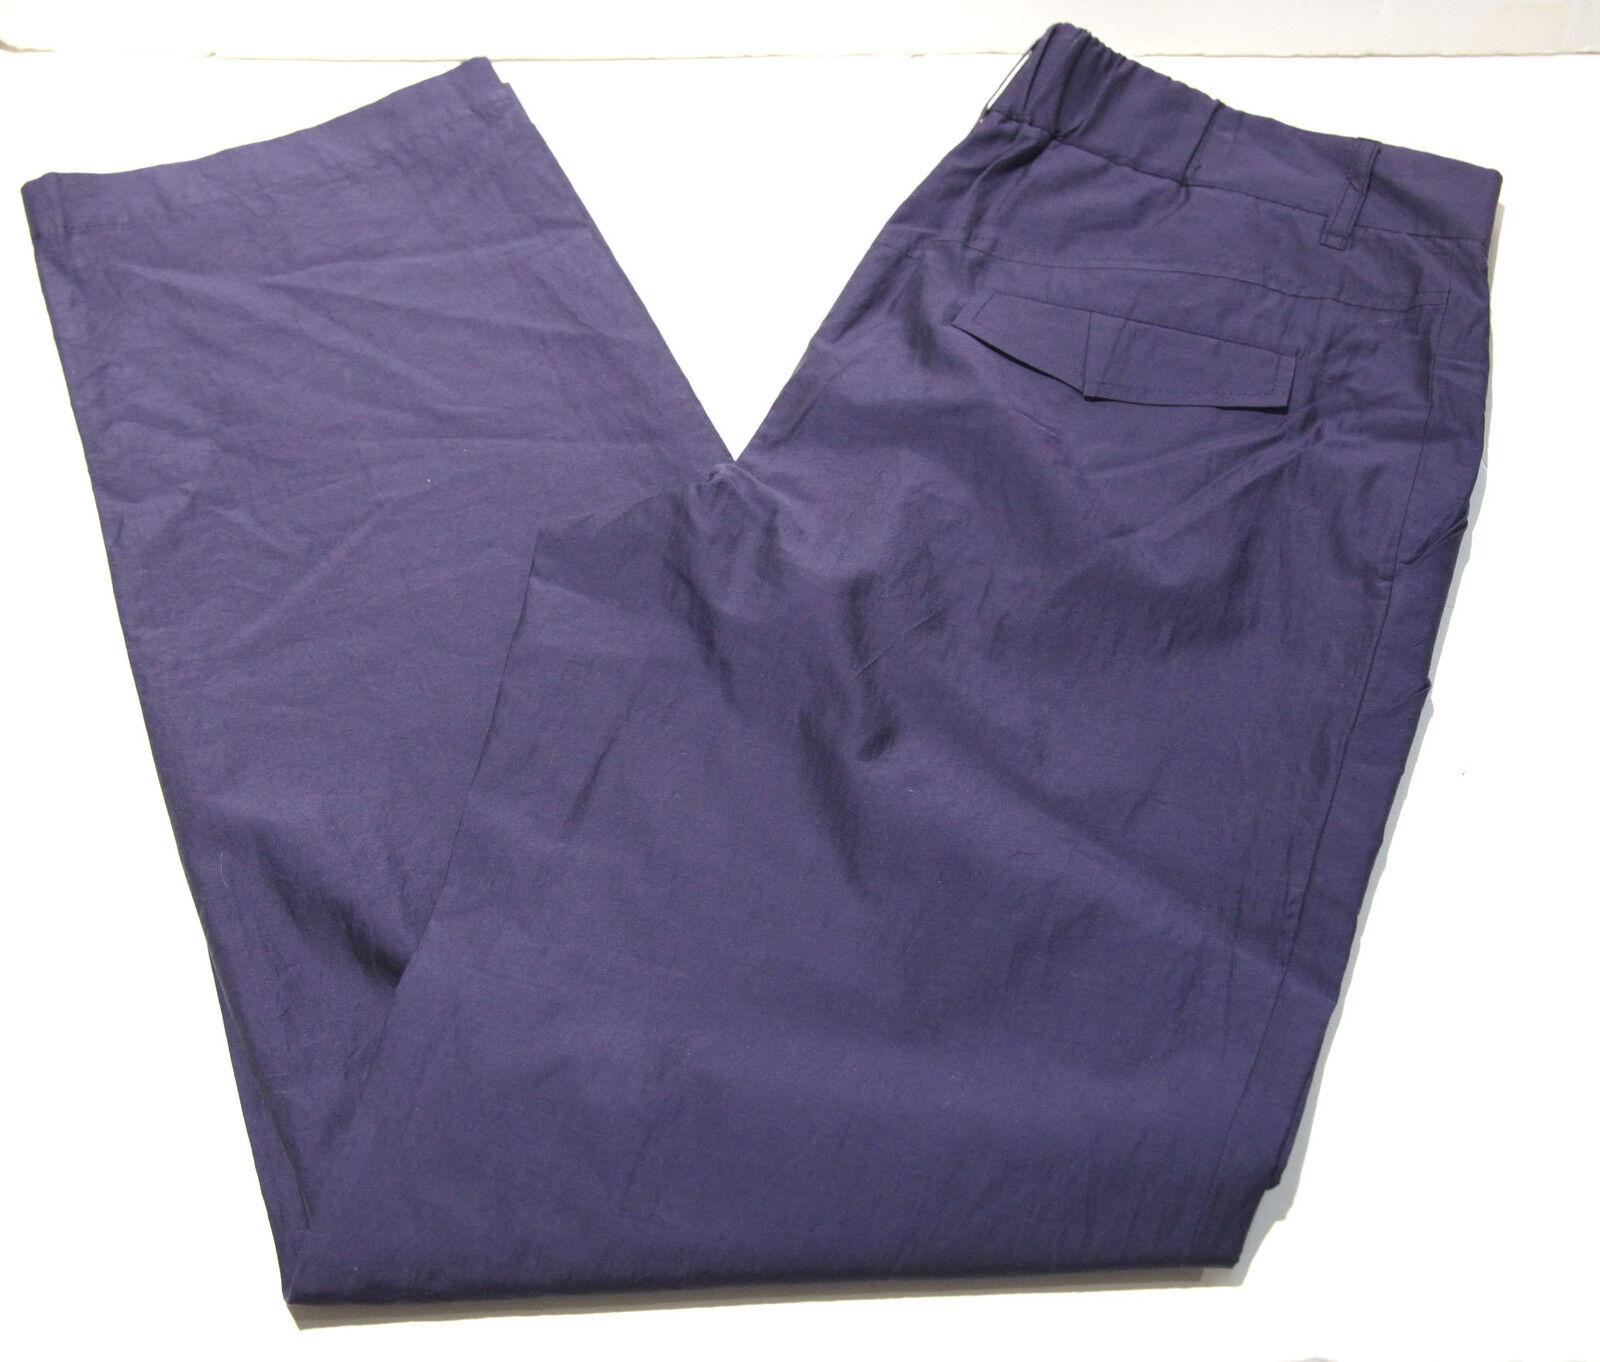 NWT Brunello Cucinelli Cotton Silk Navy bluee Pants  sz 10 FS